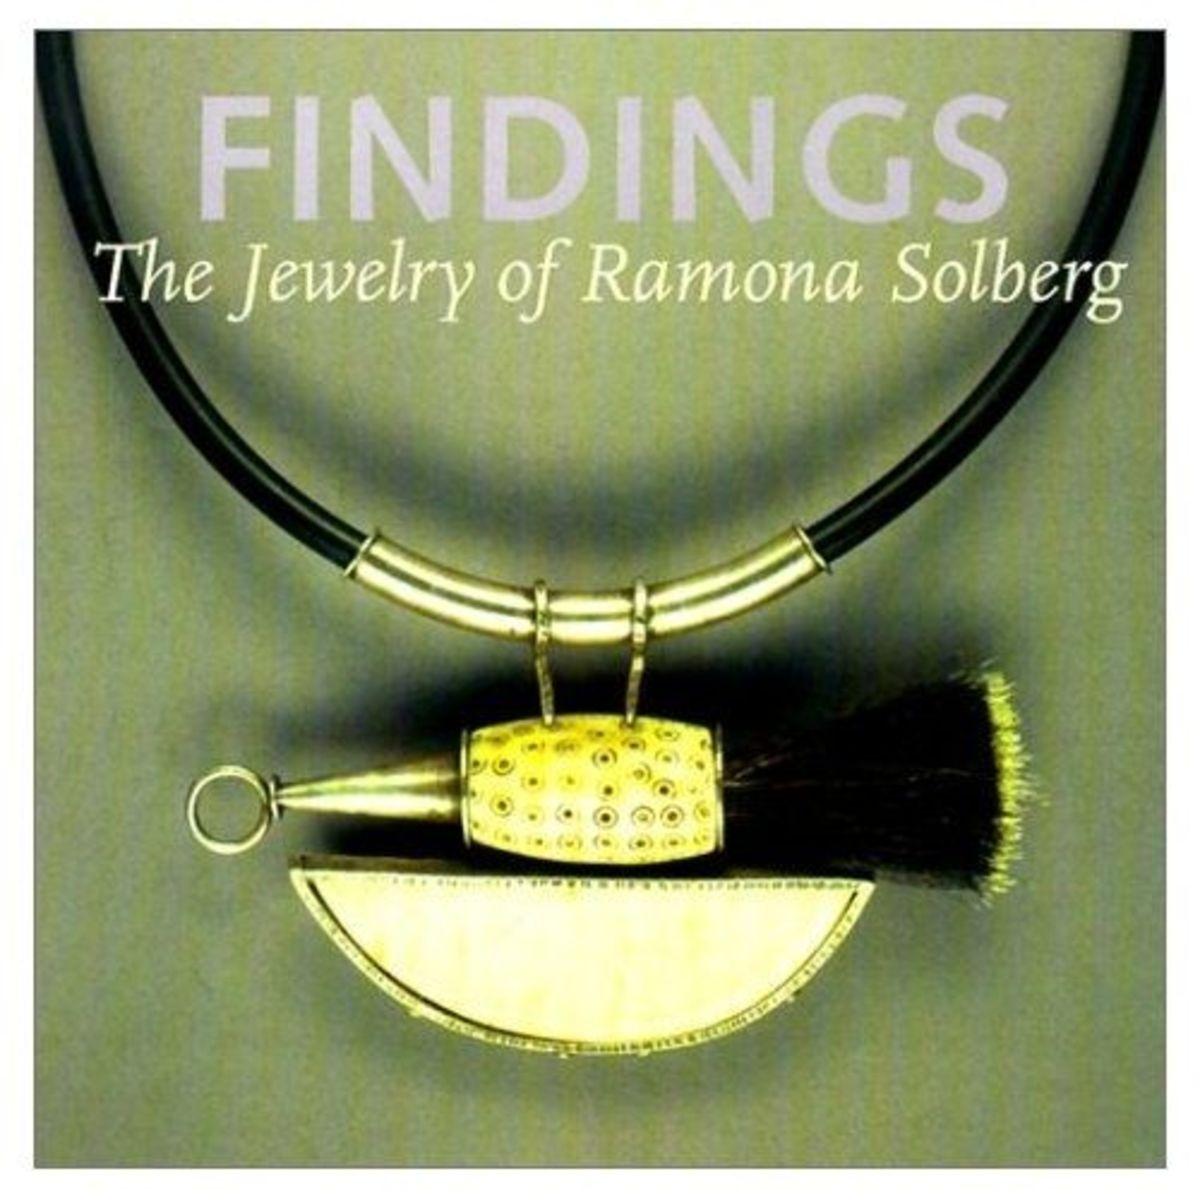 Ramona Solberg jewelry